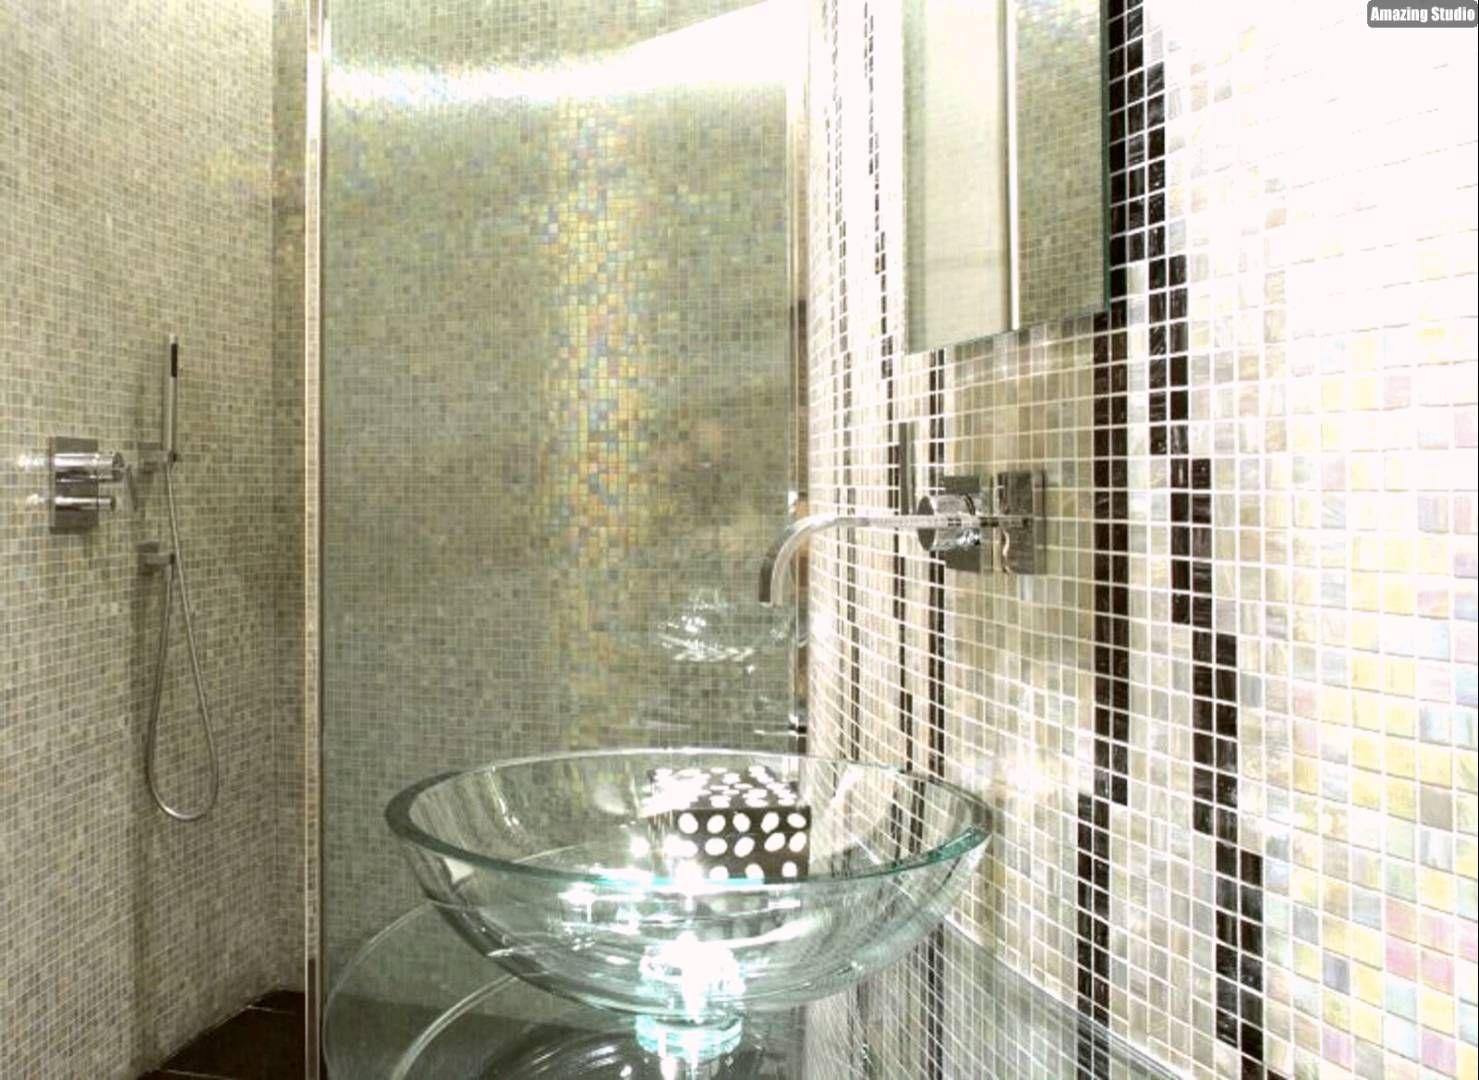 Fliesen Badezimmer ~ Mosaik fliesen badezimmer perlmutt glas waschbecken modern